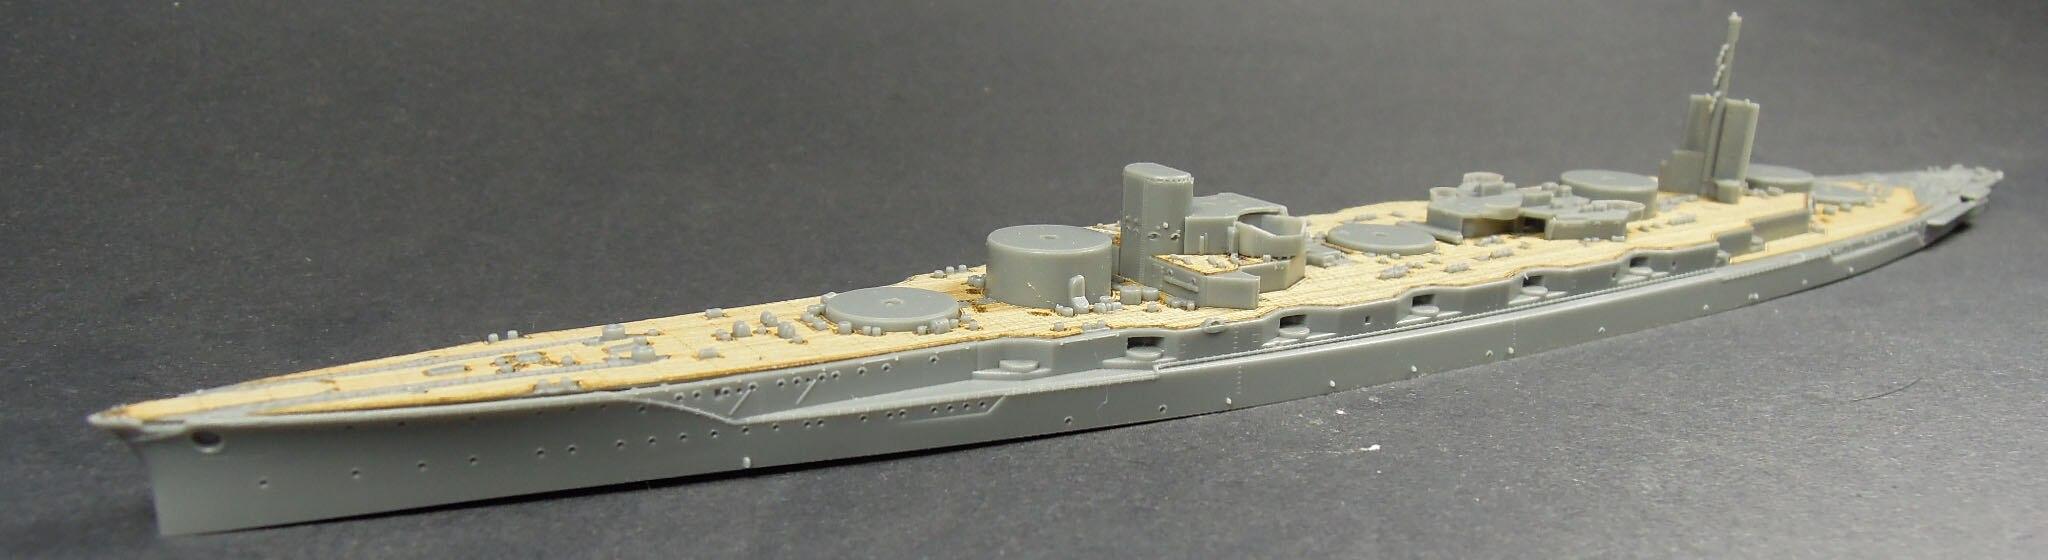 /FUJIMI ARTWOX 401188 Navy Japanese battleship Fuso wooden deck 1944 W20105